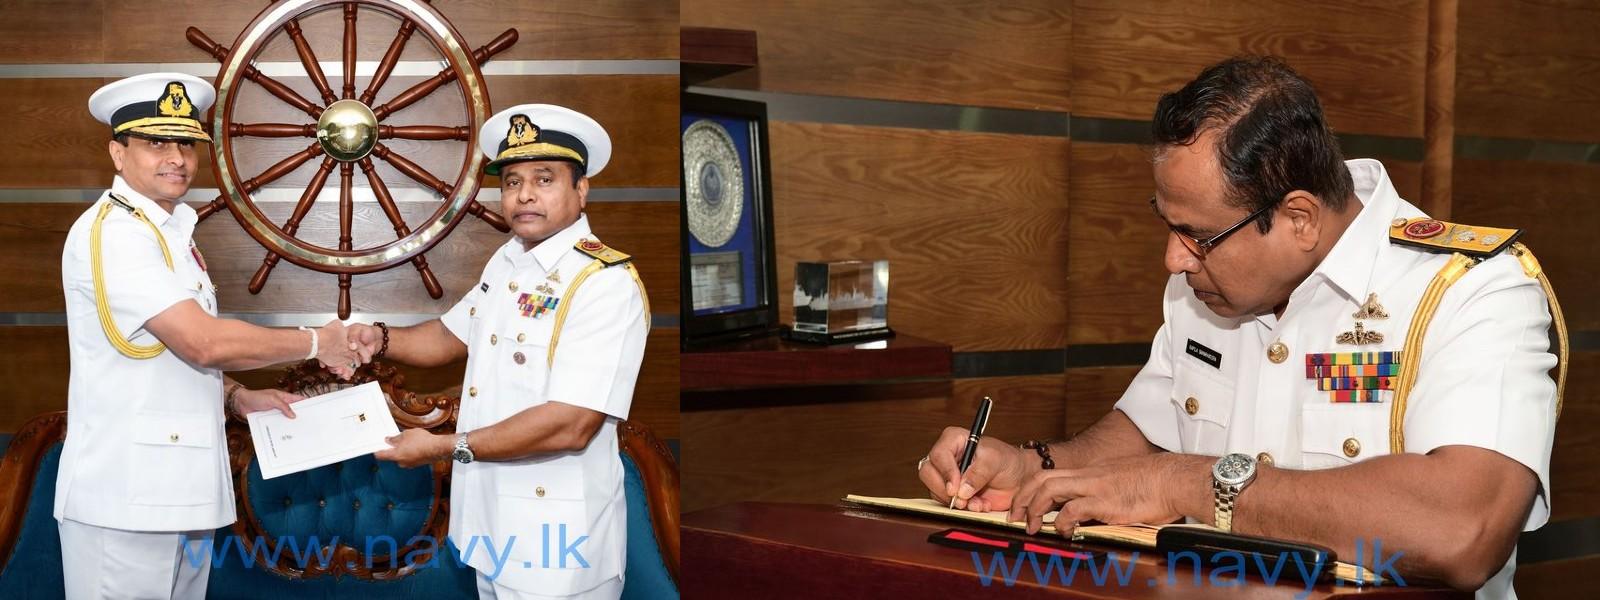 Rear Admiral Kapila Samaraweera appointed as Chief of Staff of the Sri Lanka Navy